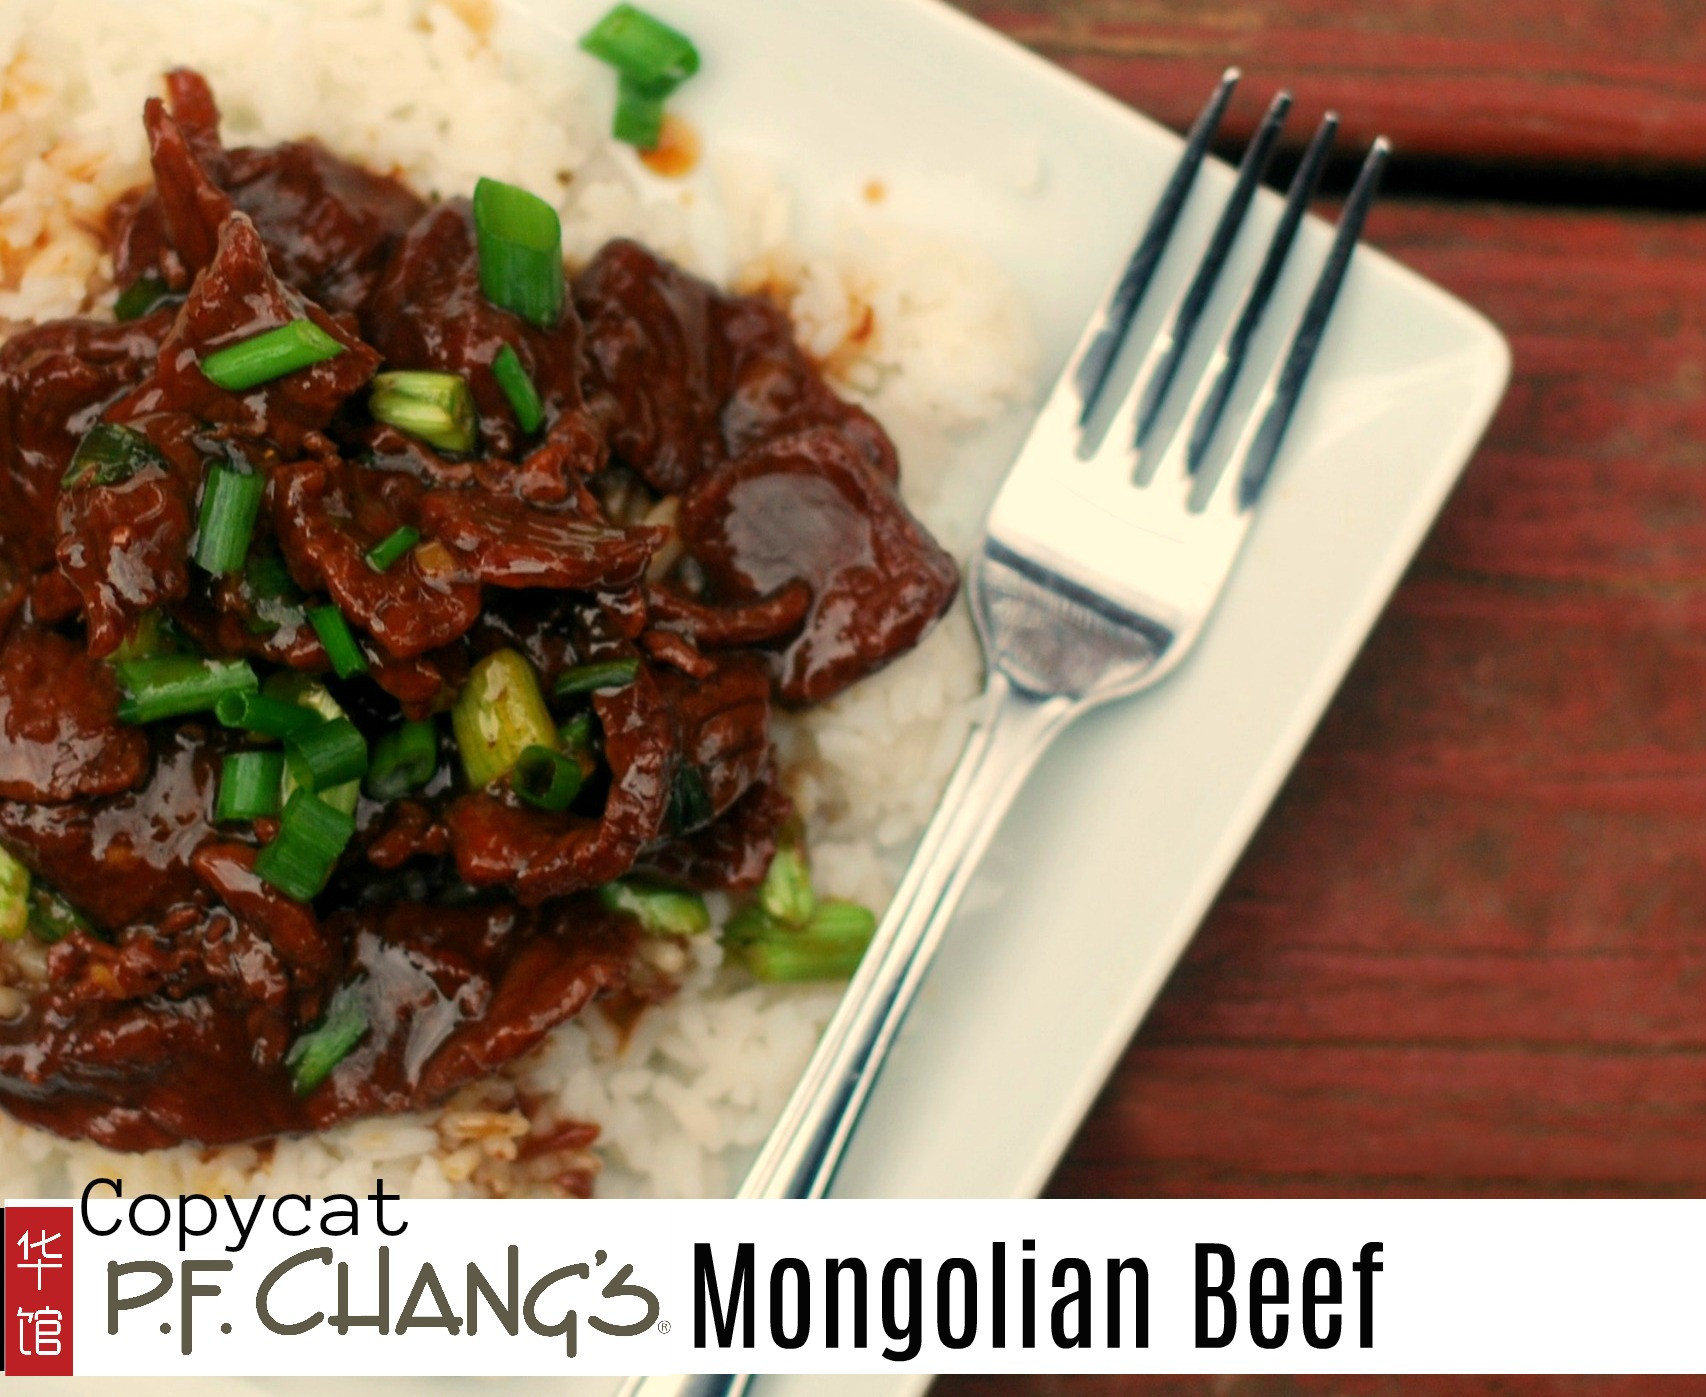 Mongolian Beef (P.F. Changs Copycat)